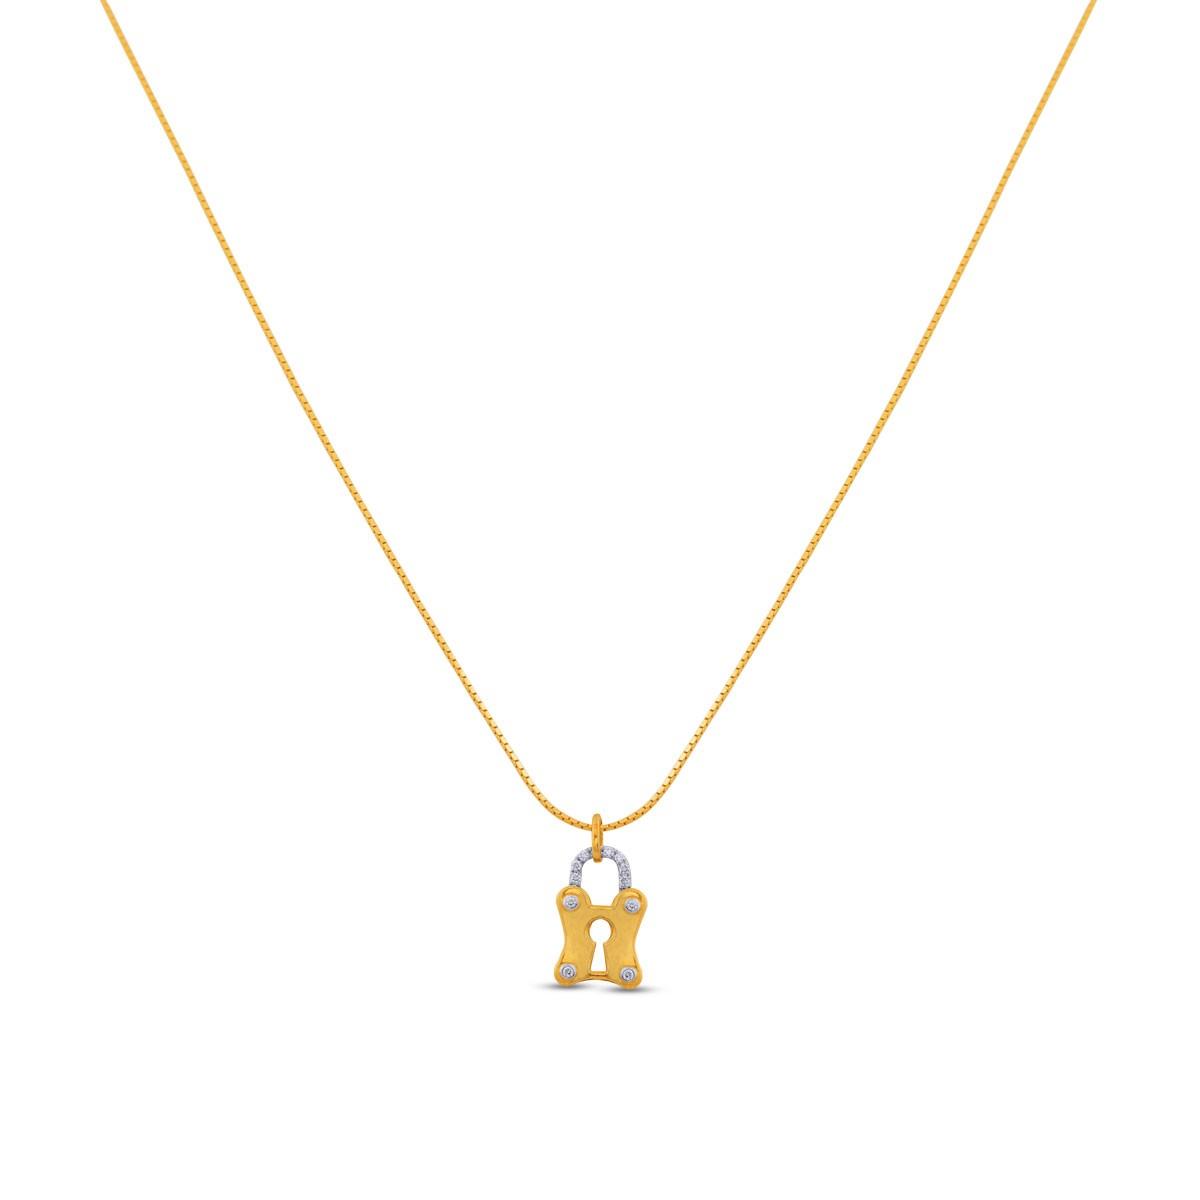 Padlock Diamond Pendant with Chain